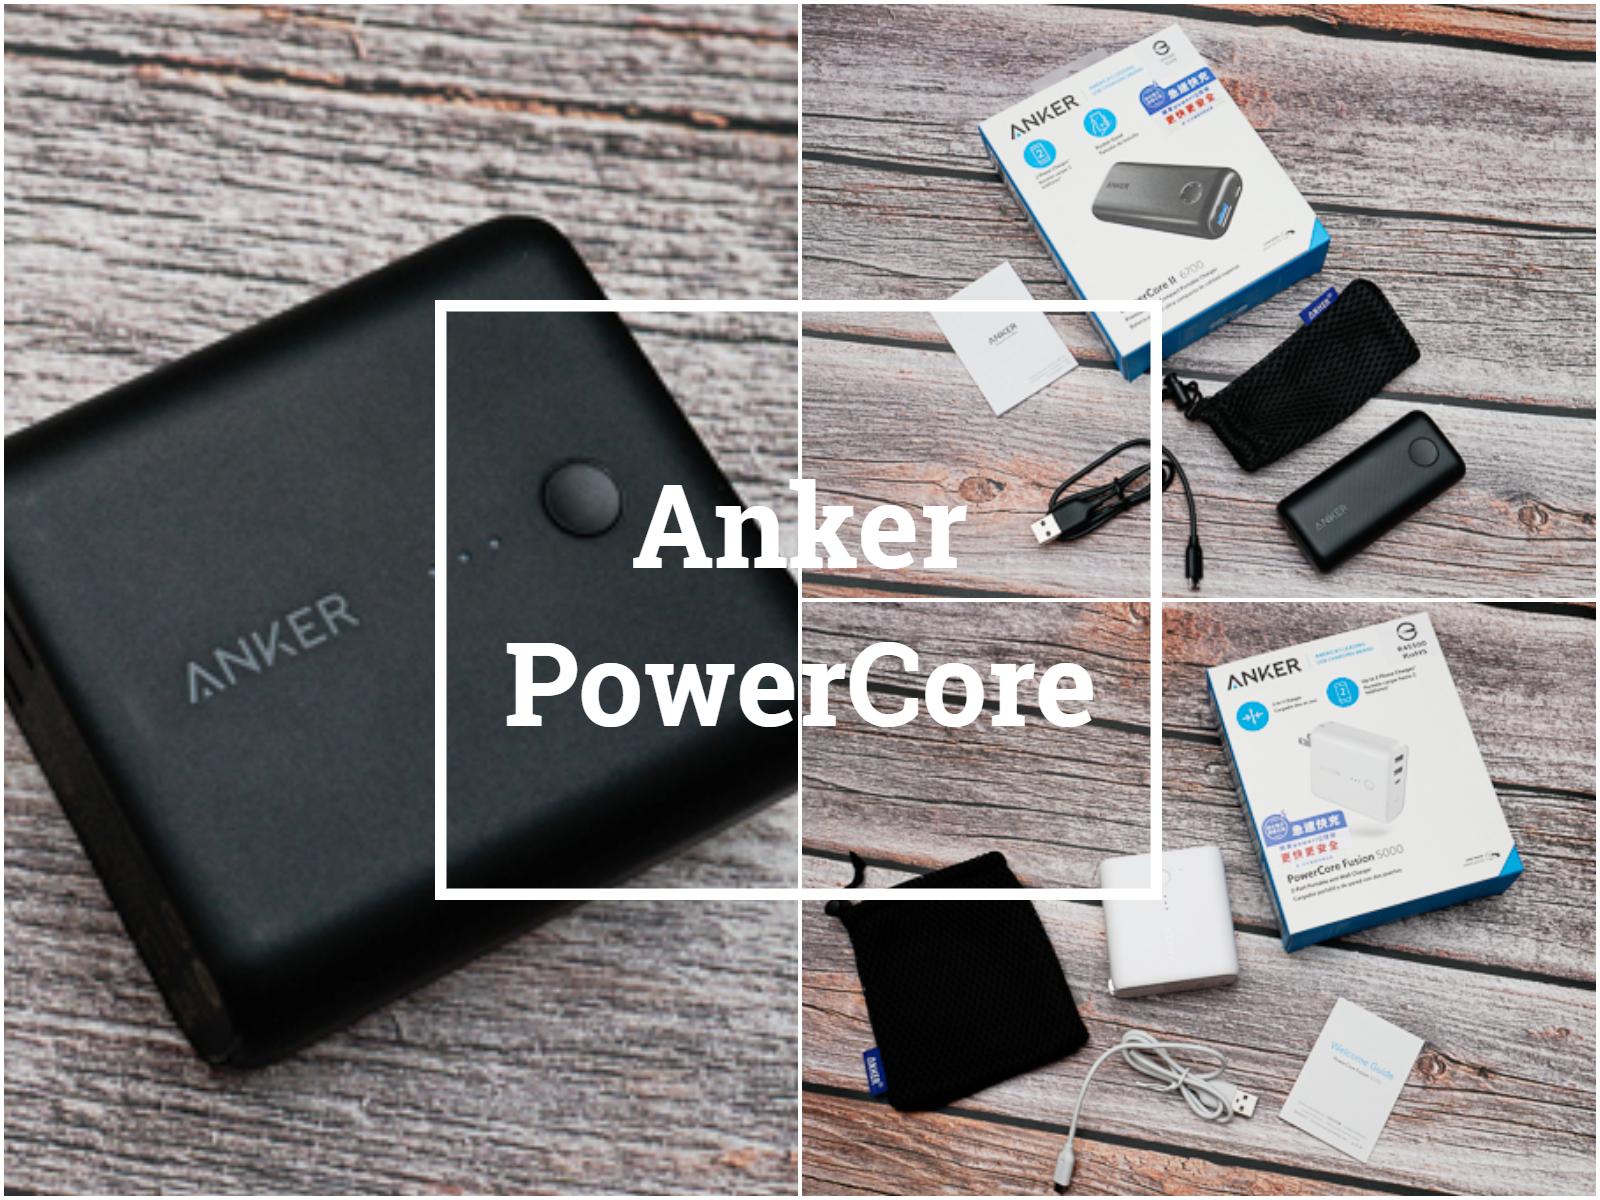 【Anker 行動電源開箱】Anker PowerCore 輕巧、安全、電量足,細部功能一次介紹給你!